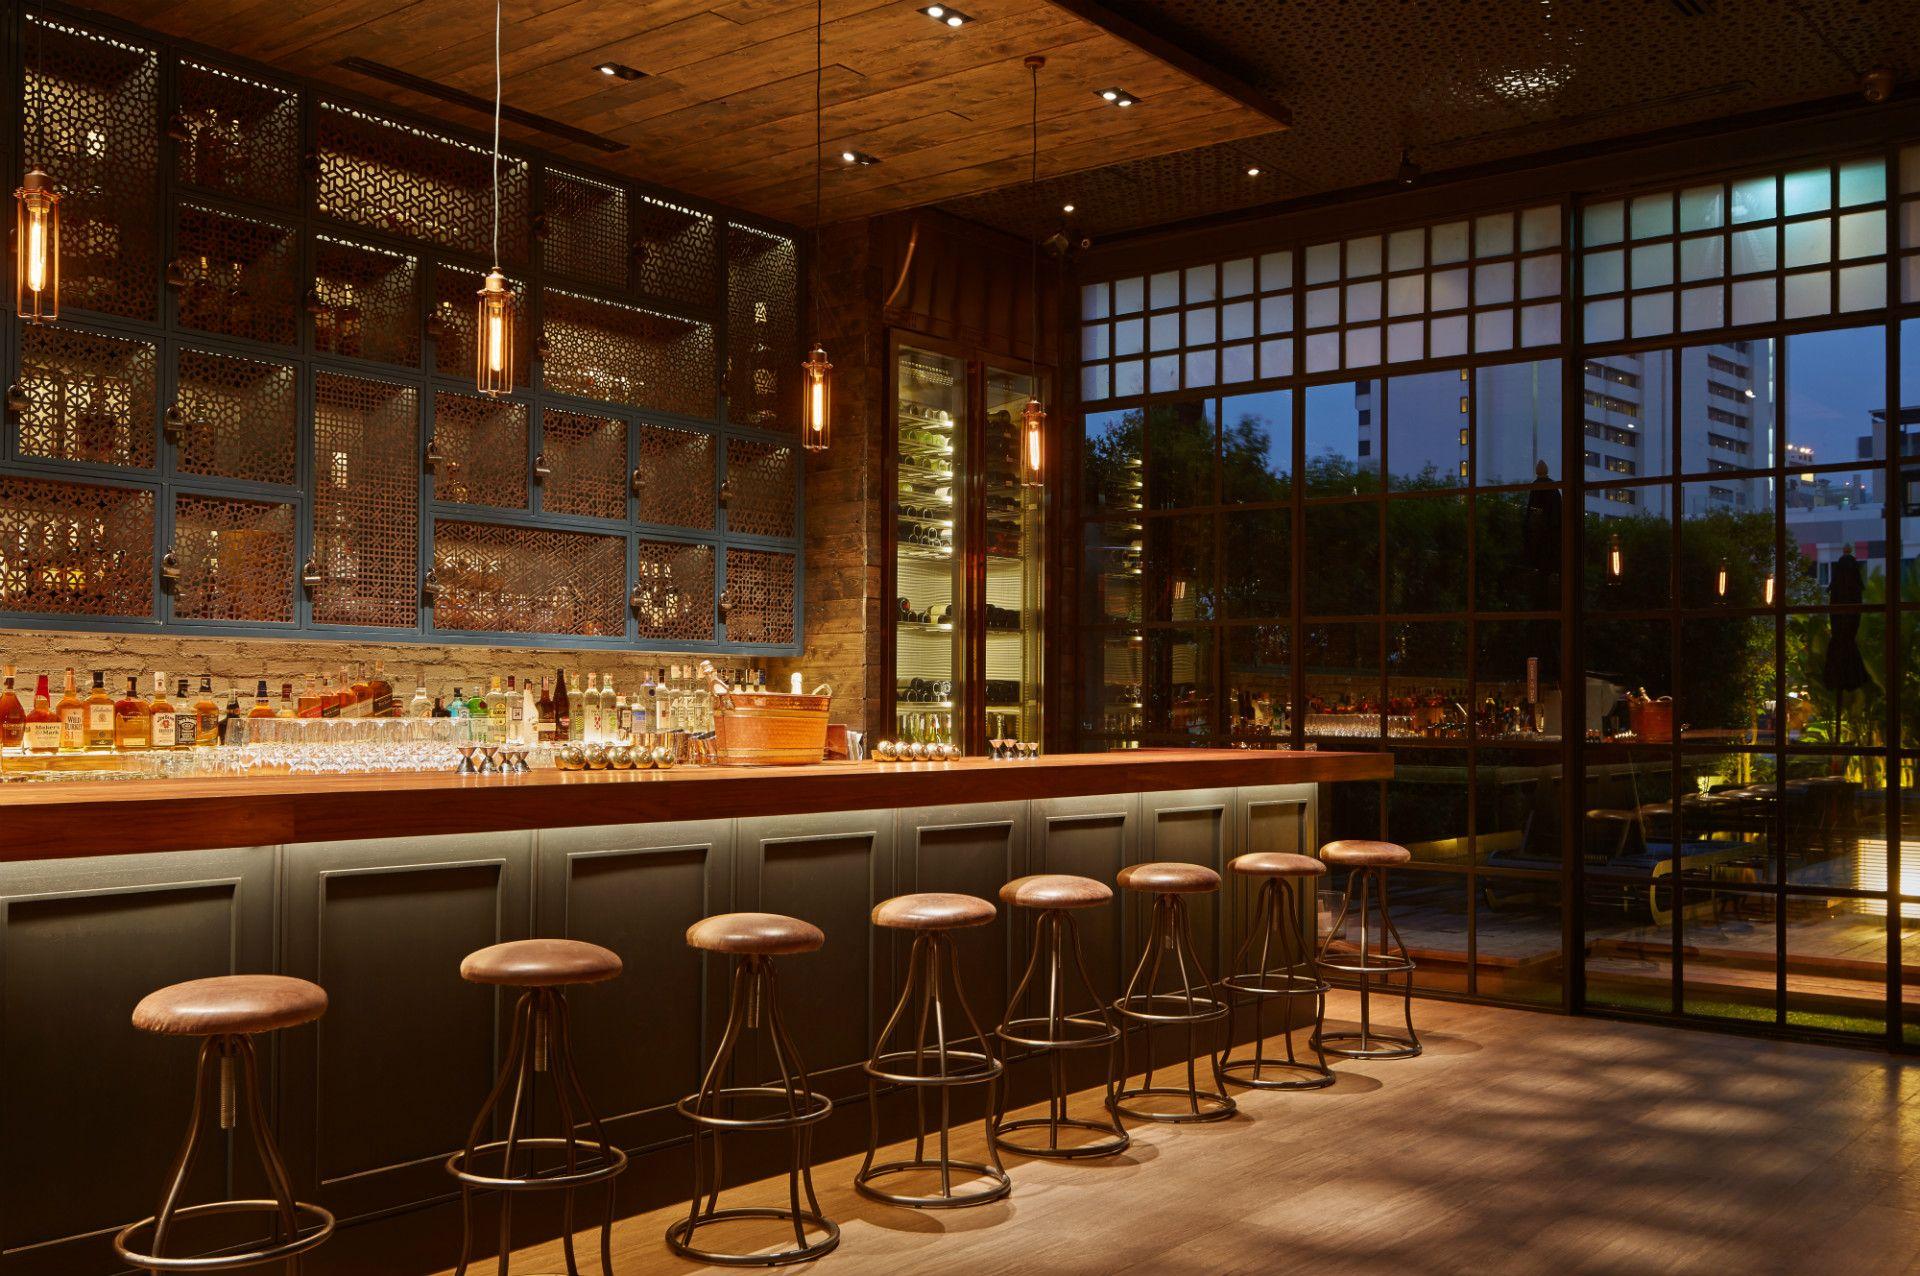 Indian restaurants interior design charcoalopt  venue designs  pinterest  restaurant wine